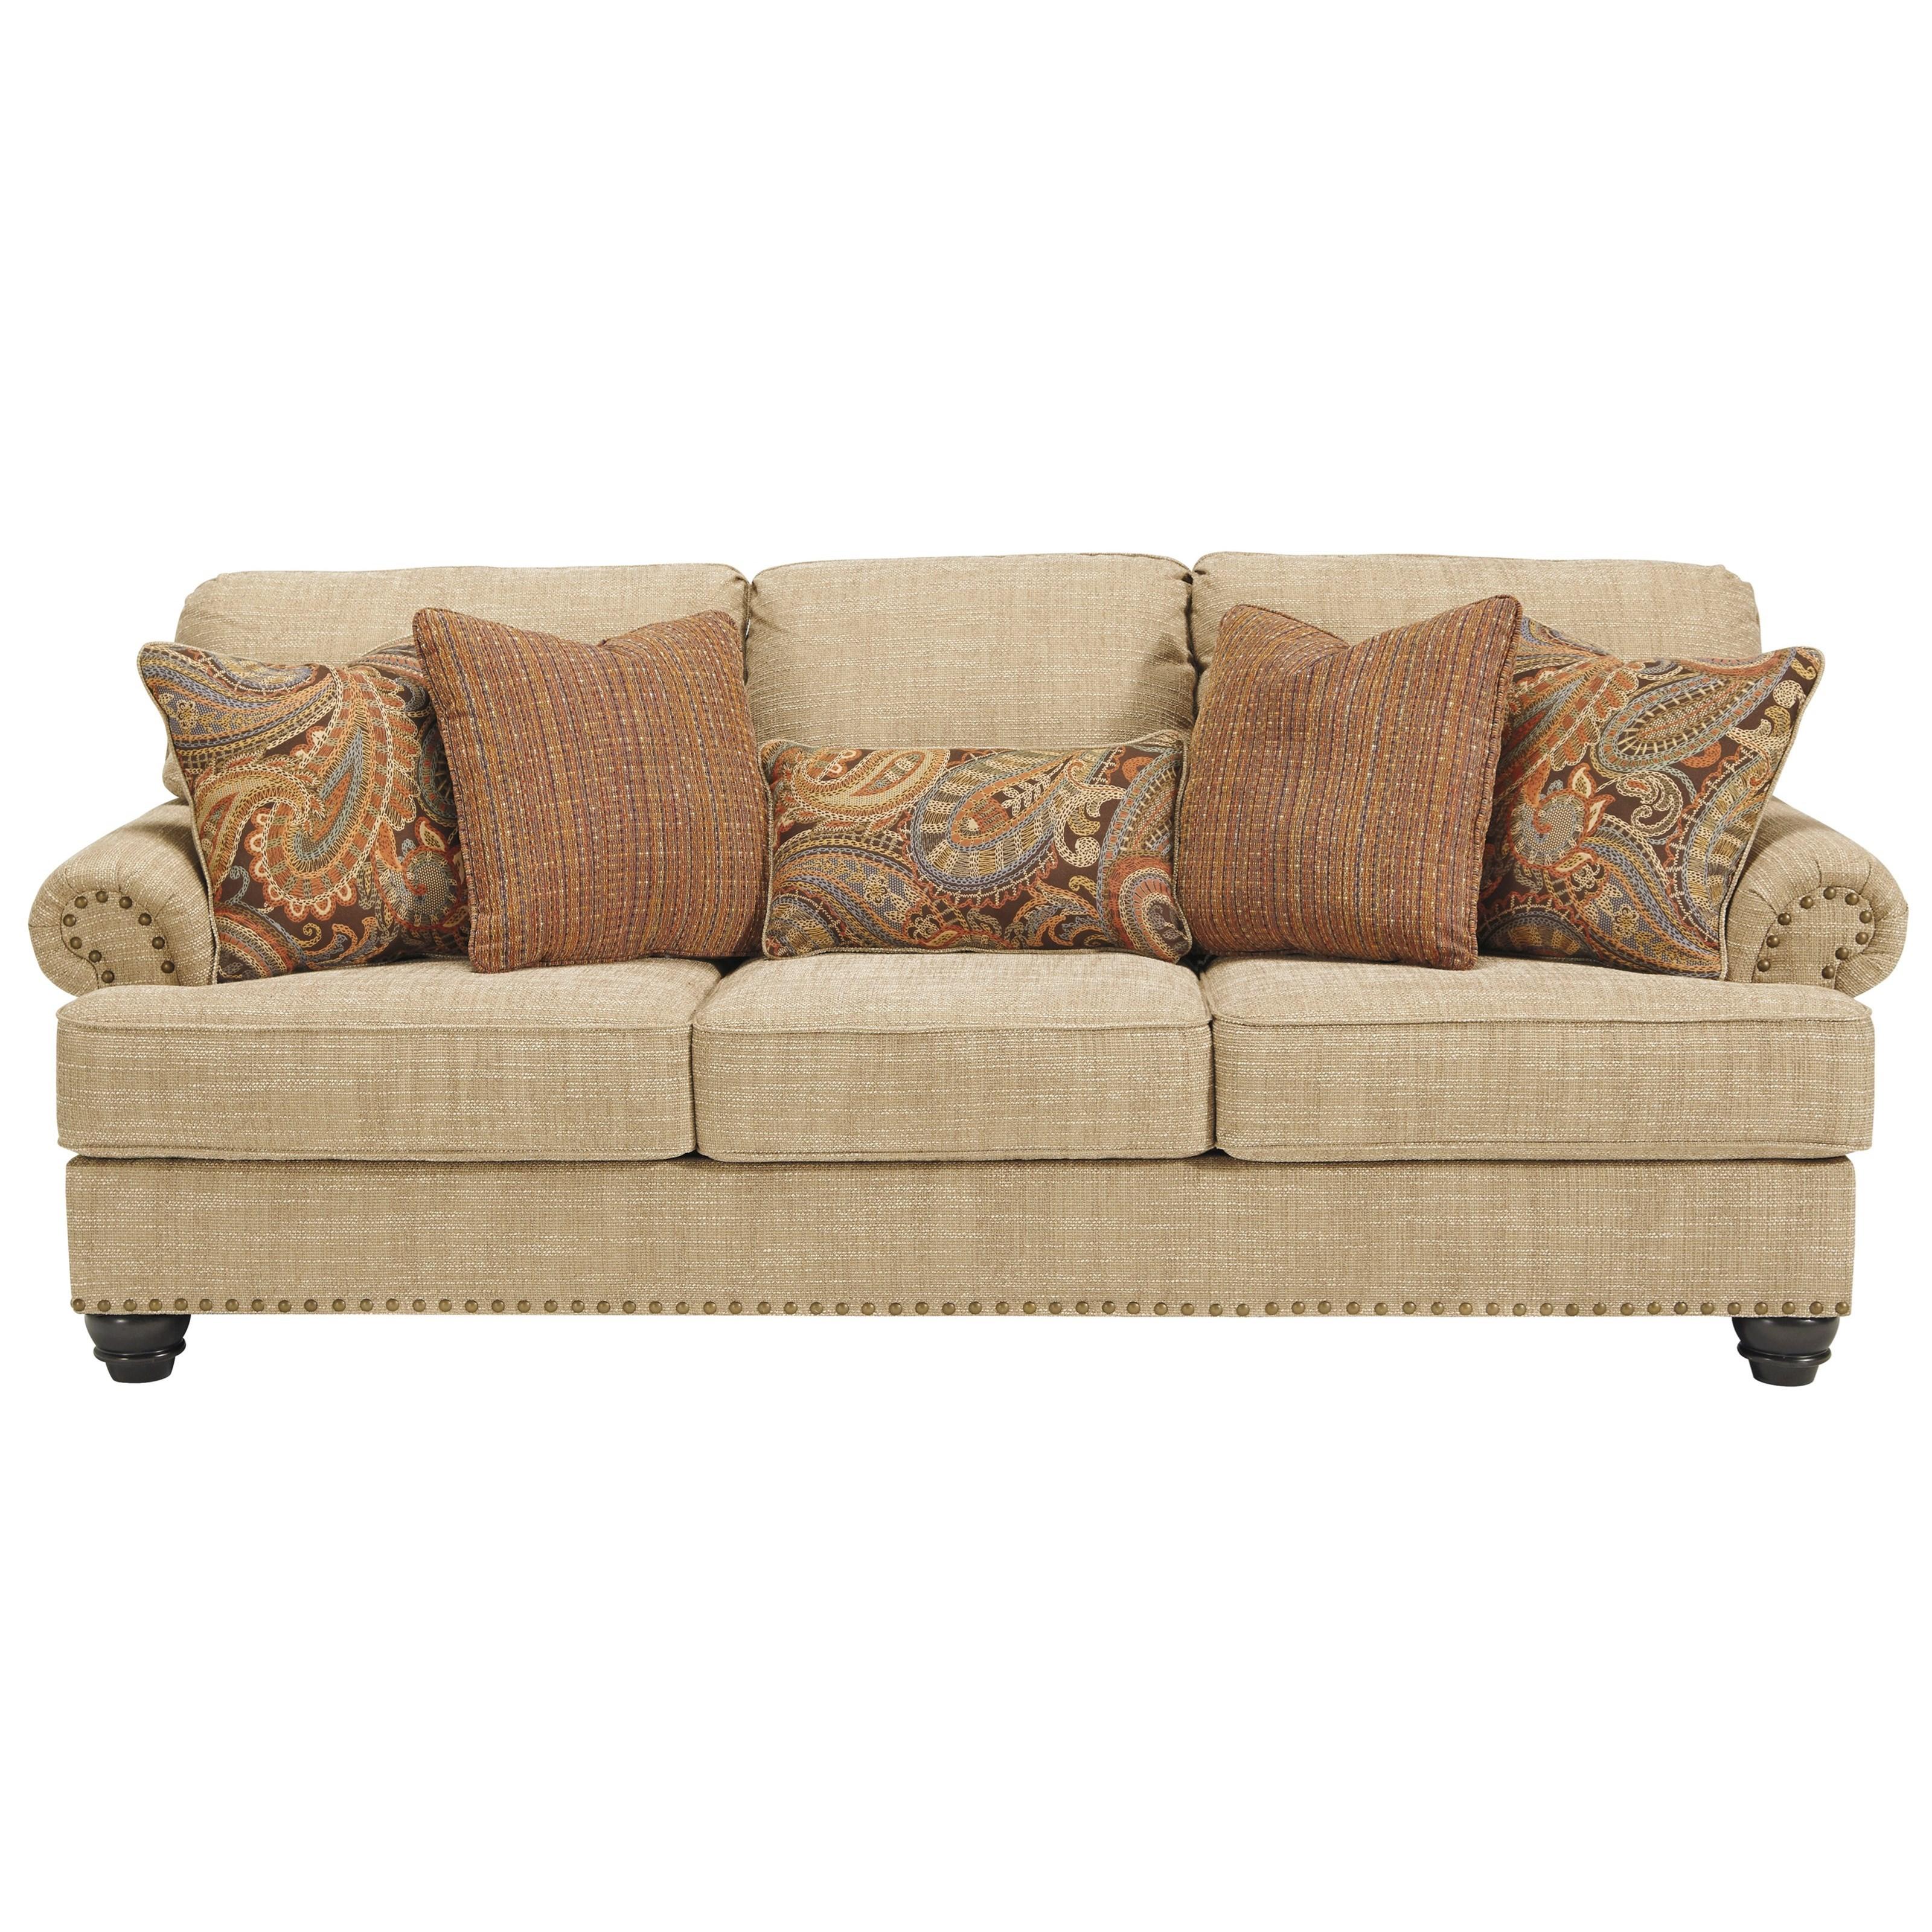 Benchcraft Candoro Queen Size Sofa Sleeper - Item Number: 1180638